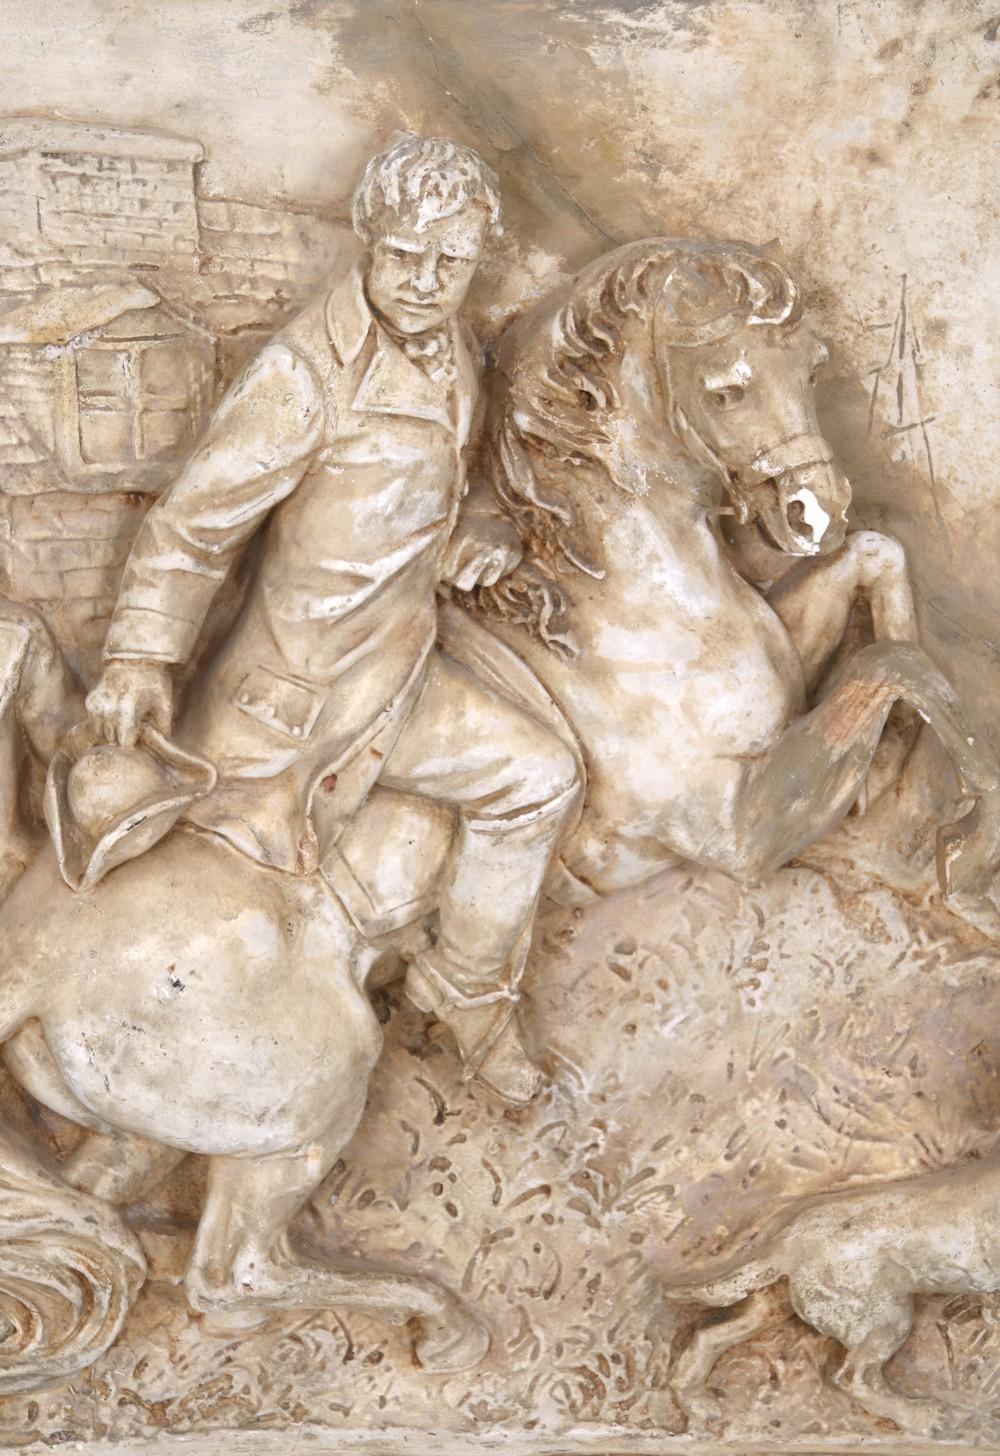 Cyrus Cobb (American, 1834-1903)